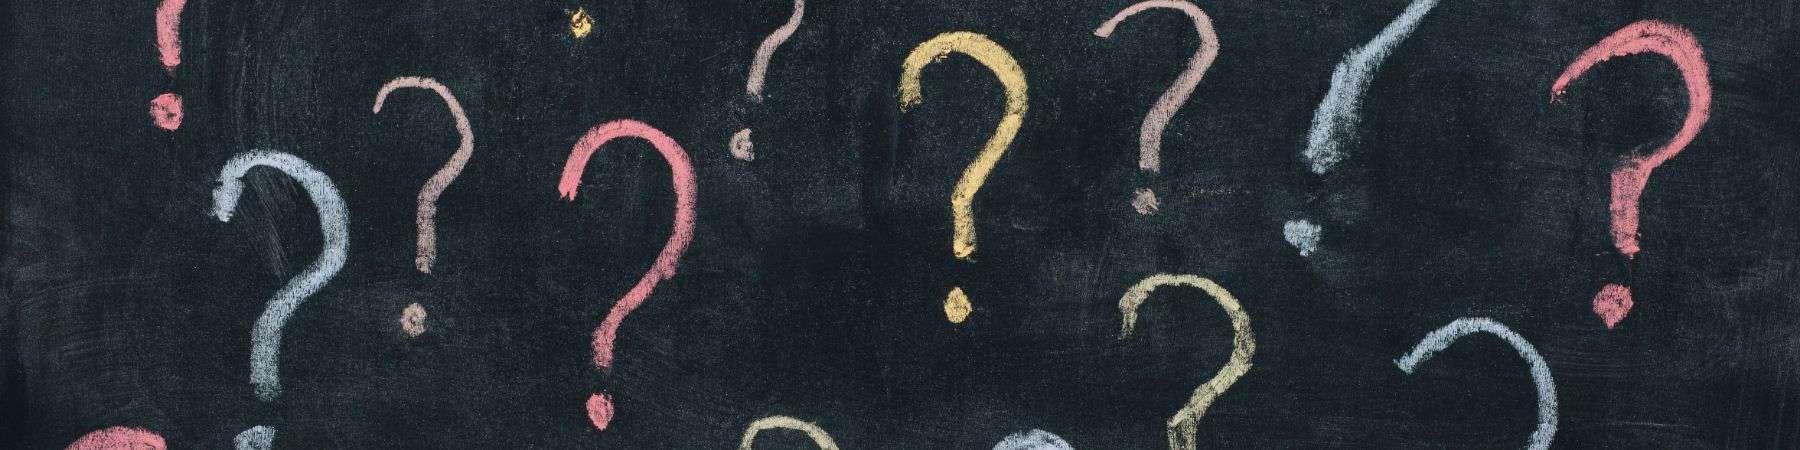 question marks on a chalkboard